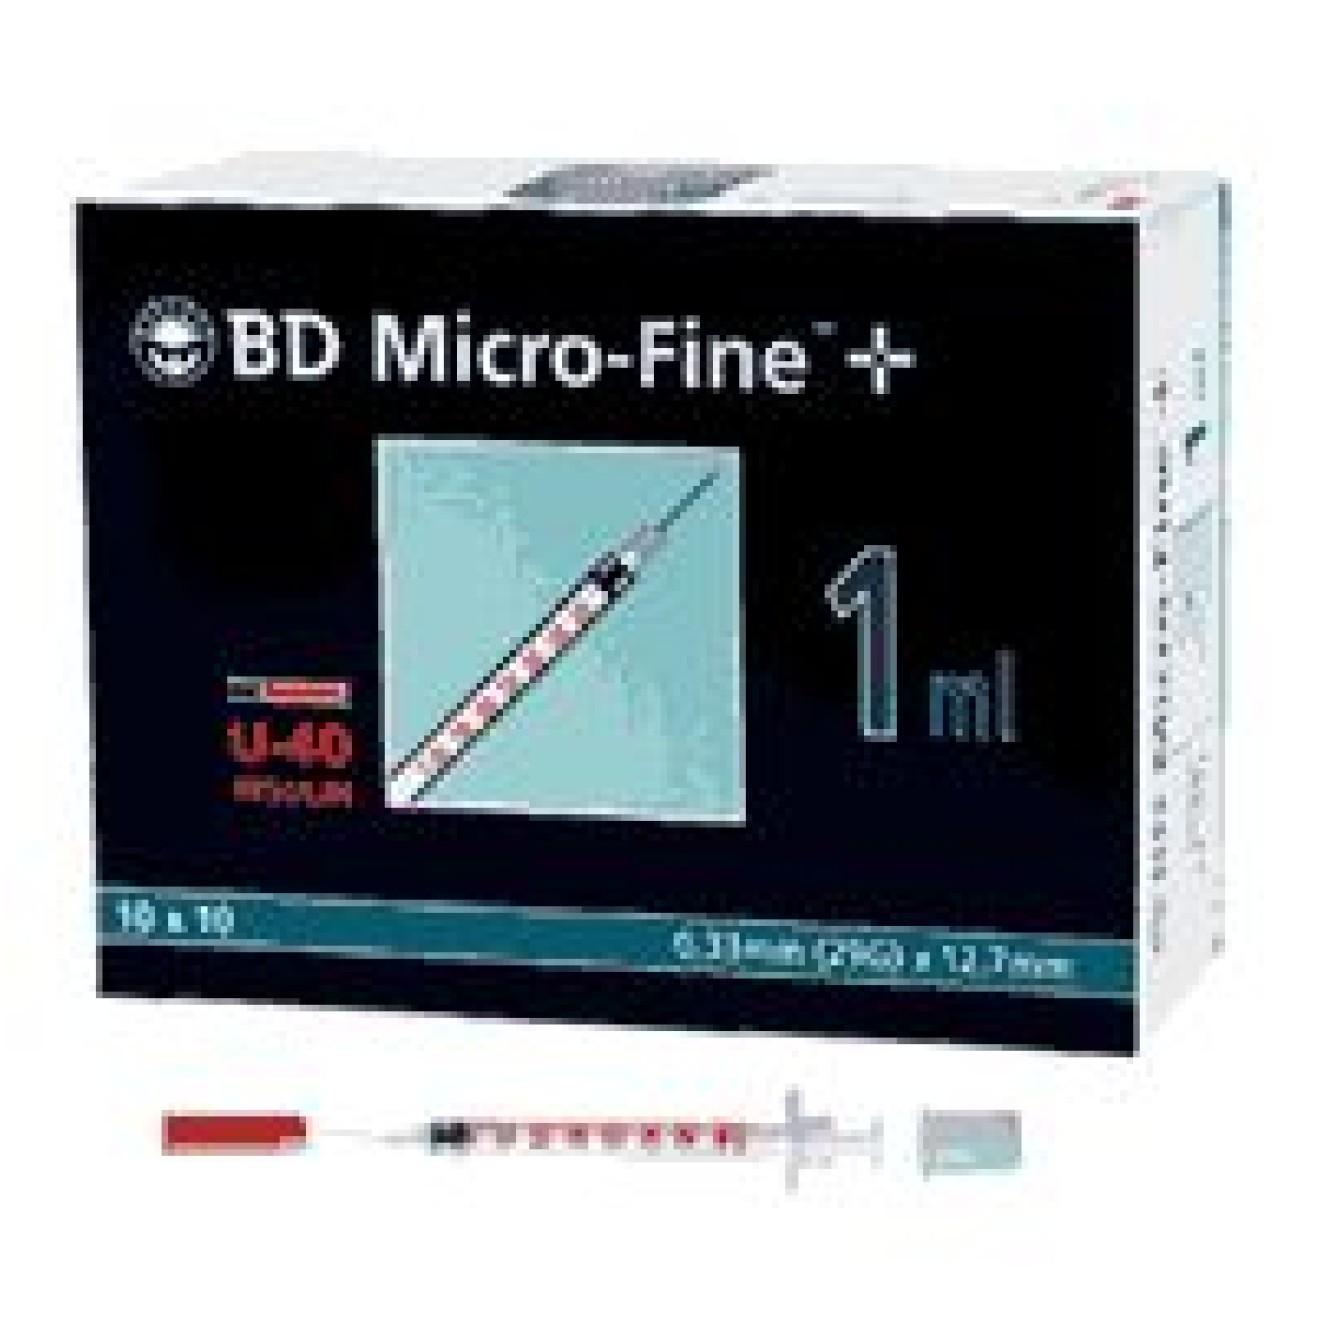 Bd Micro Fine U 40 Insulin Spritze 12 7 Mm 100x1 Ml Bestimed Shop Inkontinenz Und